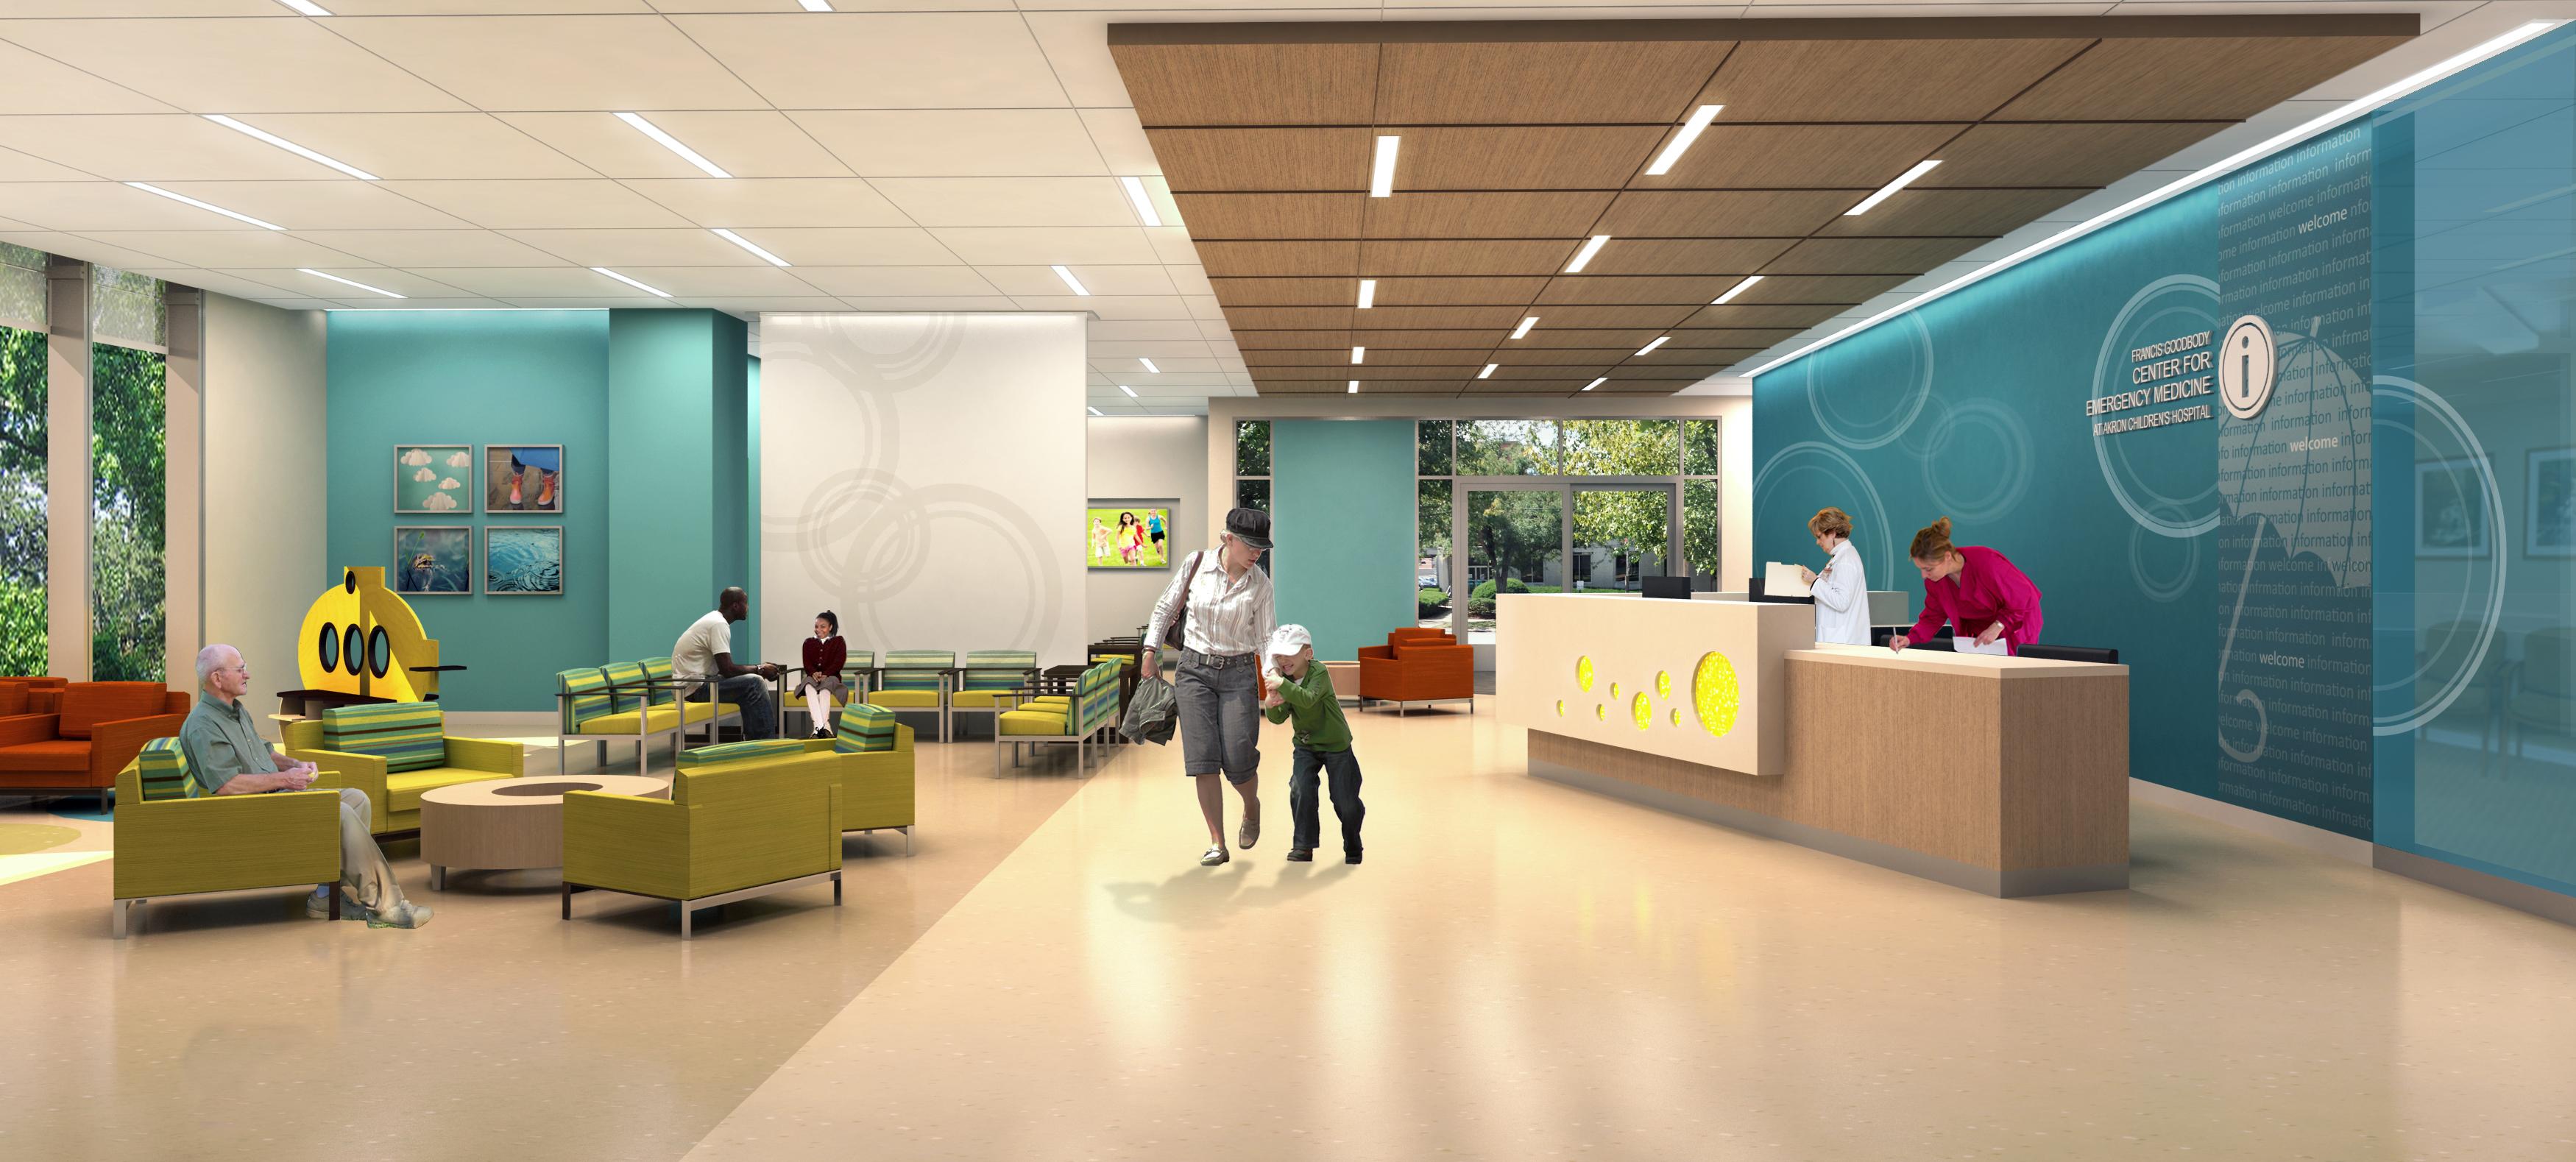 New Building Interiors Focus On The Backyard Theme